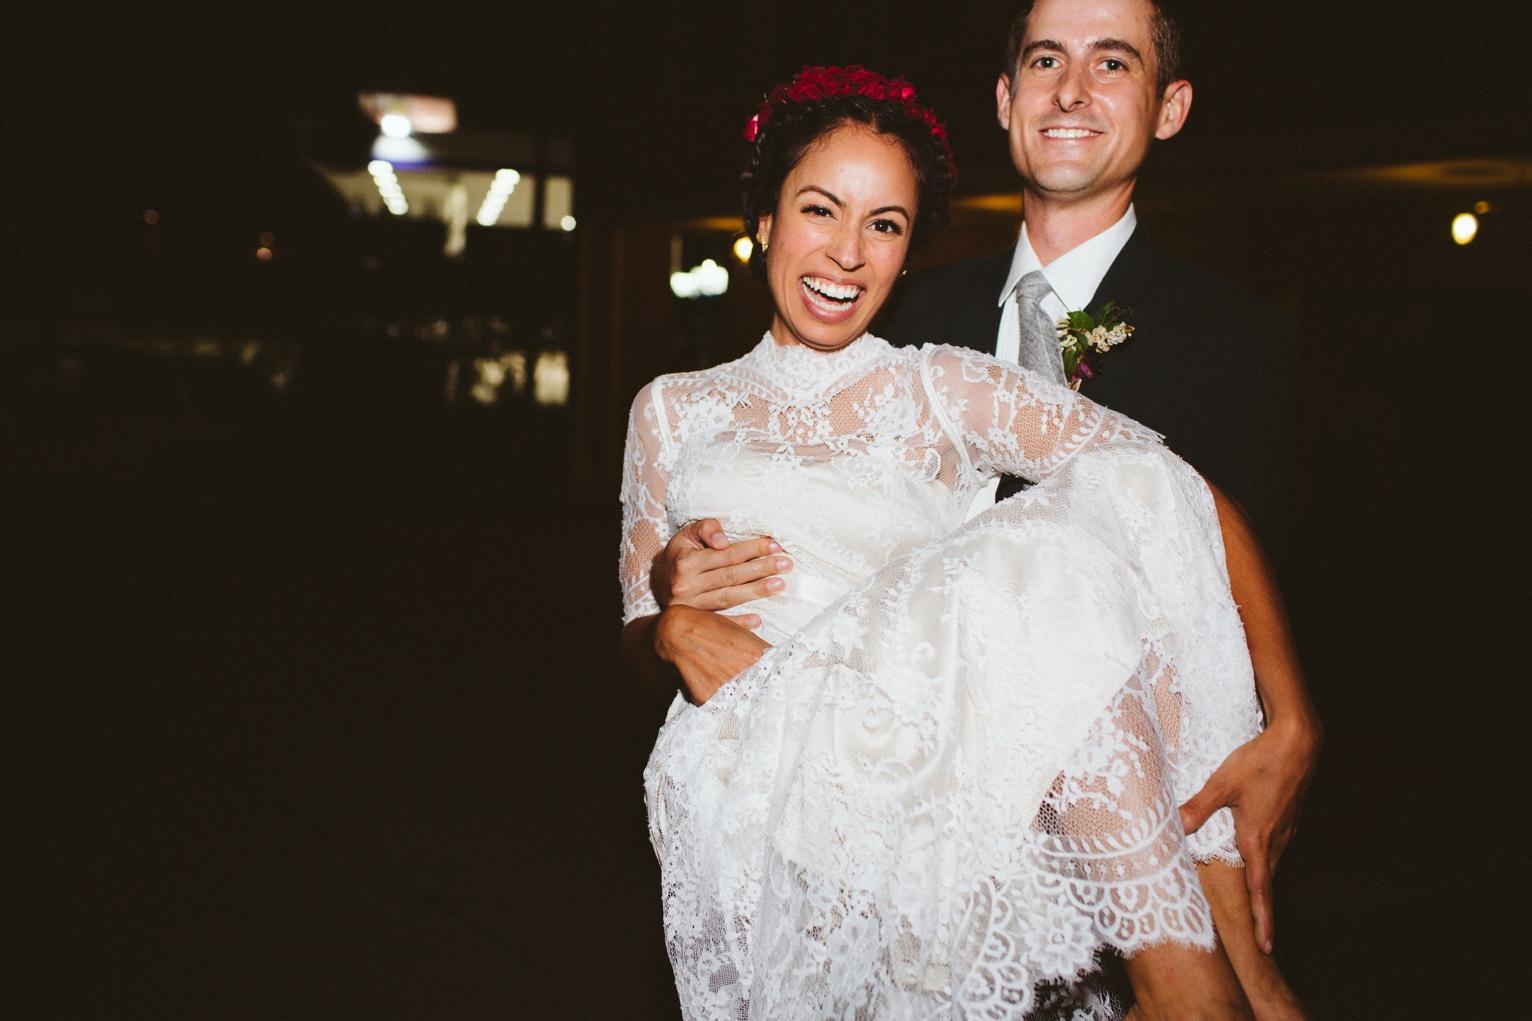 Dreamtownco.com_blog_Elliot&Melissa_Wedding_0197.jpg